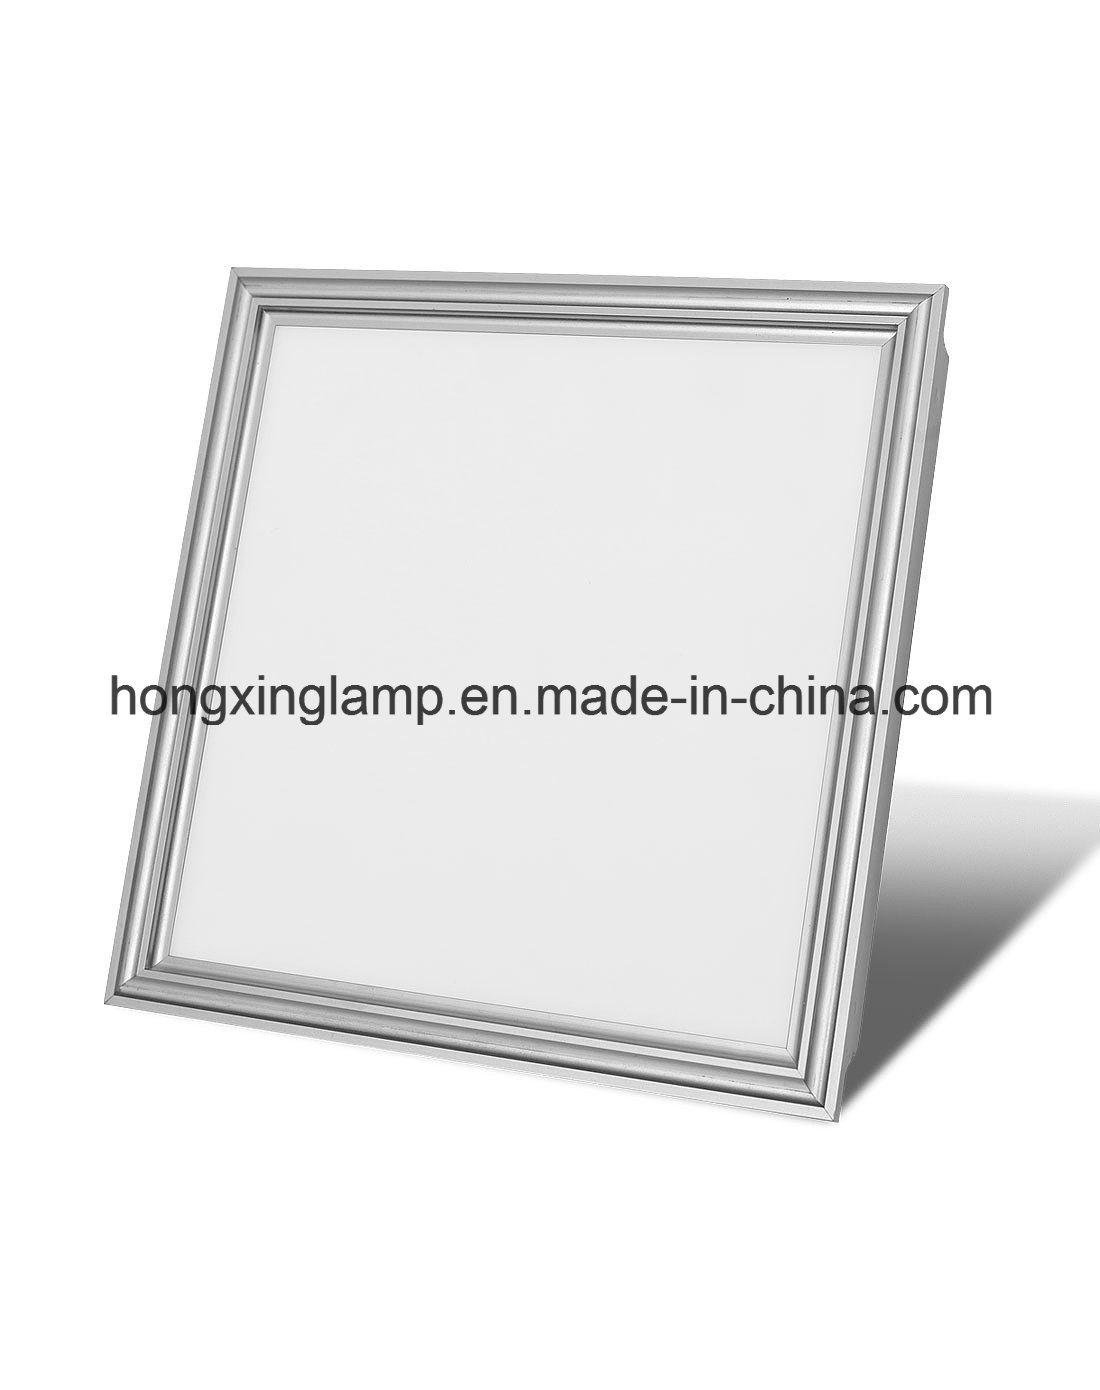 LED Panel Light 300*300mm 18W